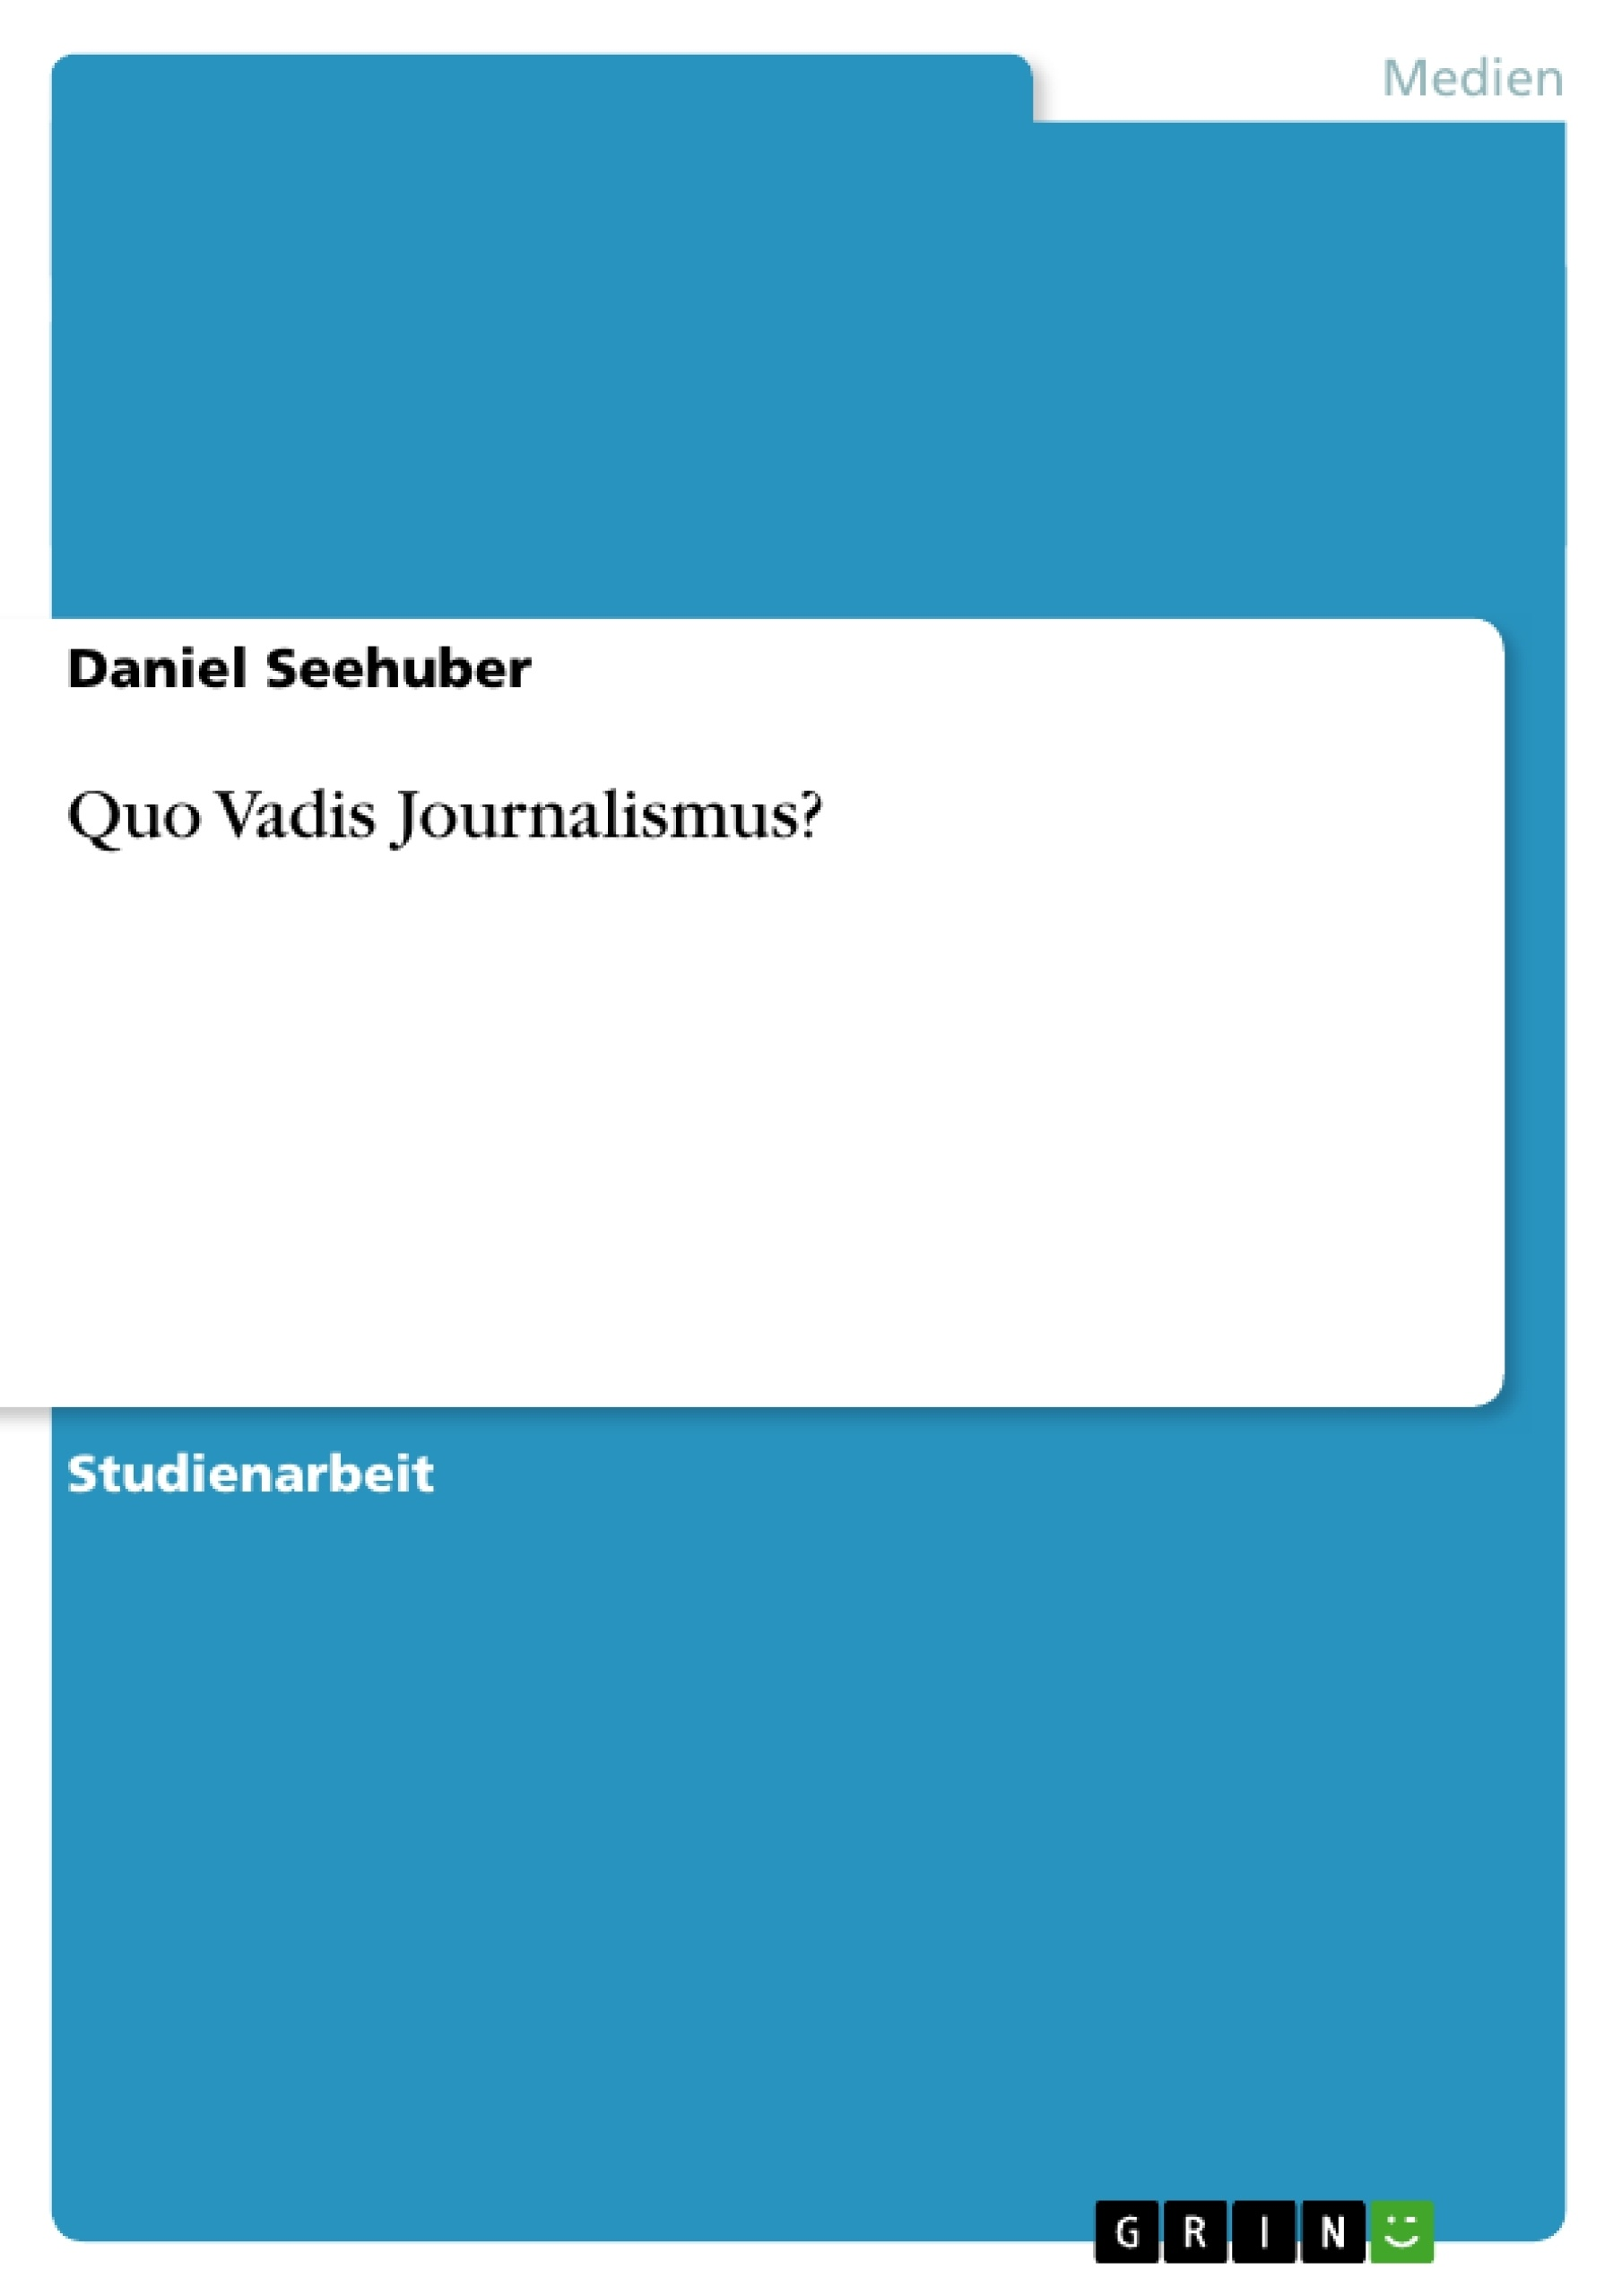 Titel: Quo Vadis Journalismus?